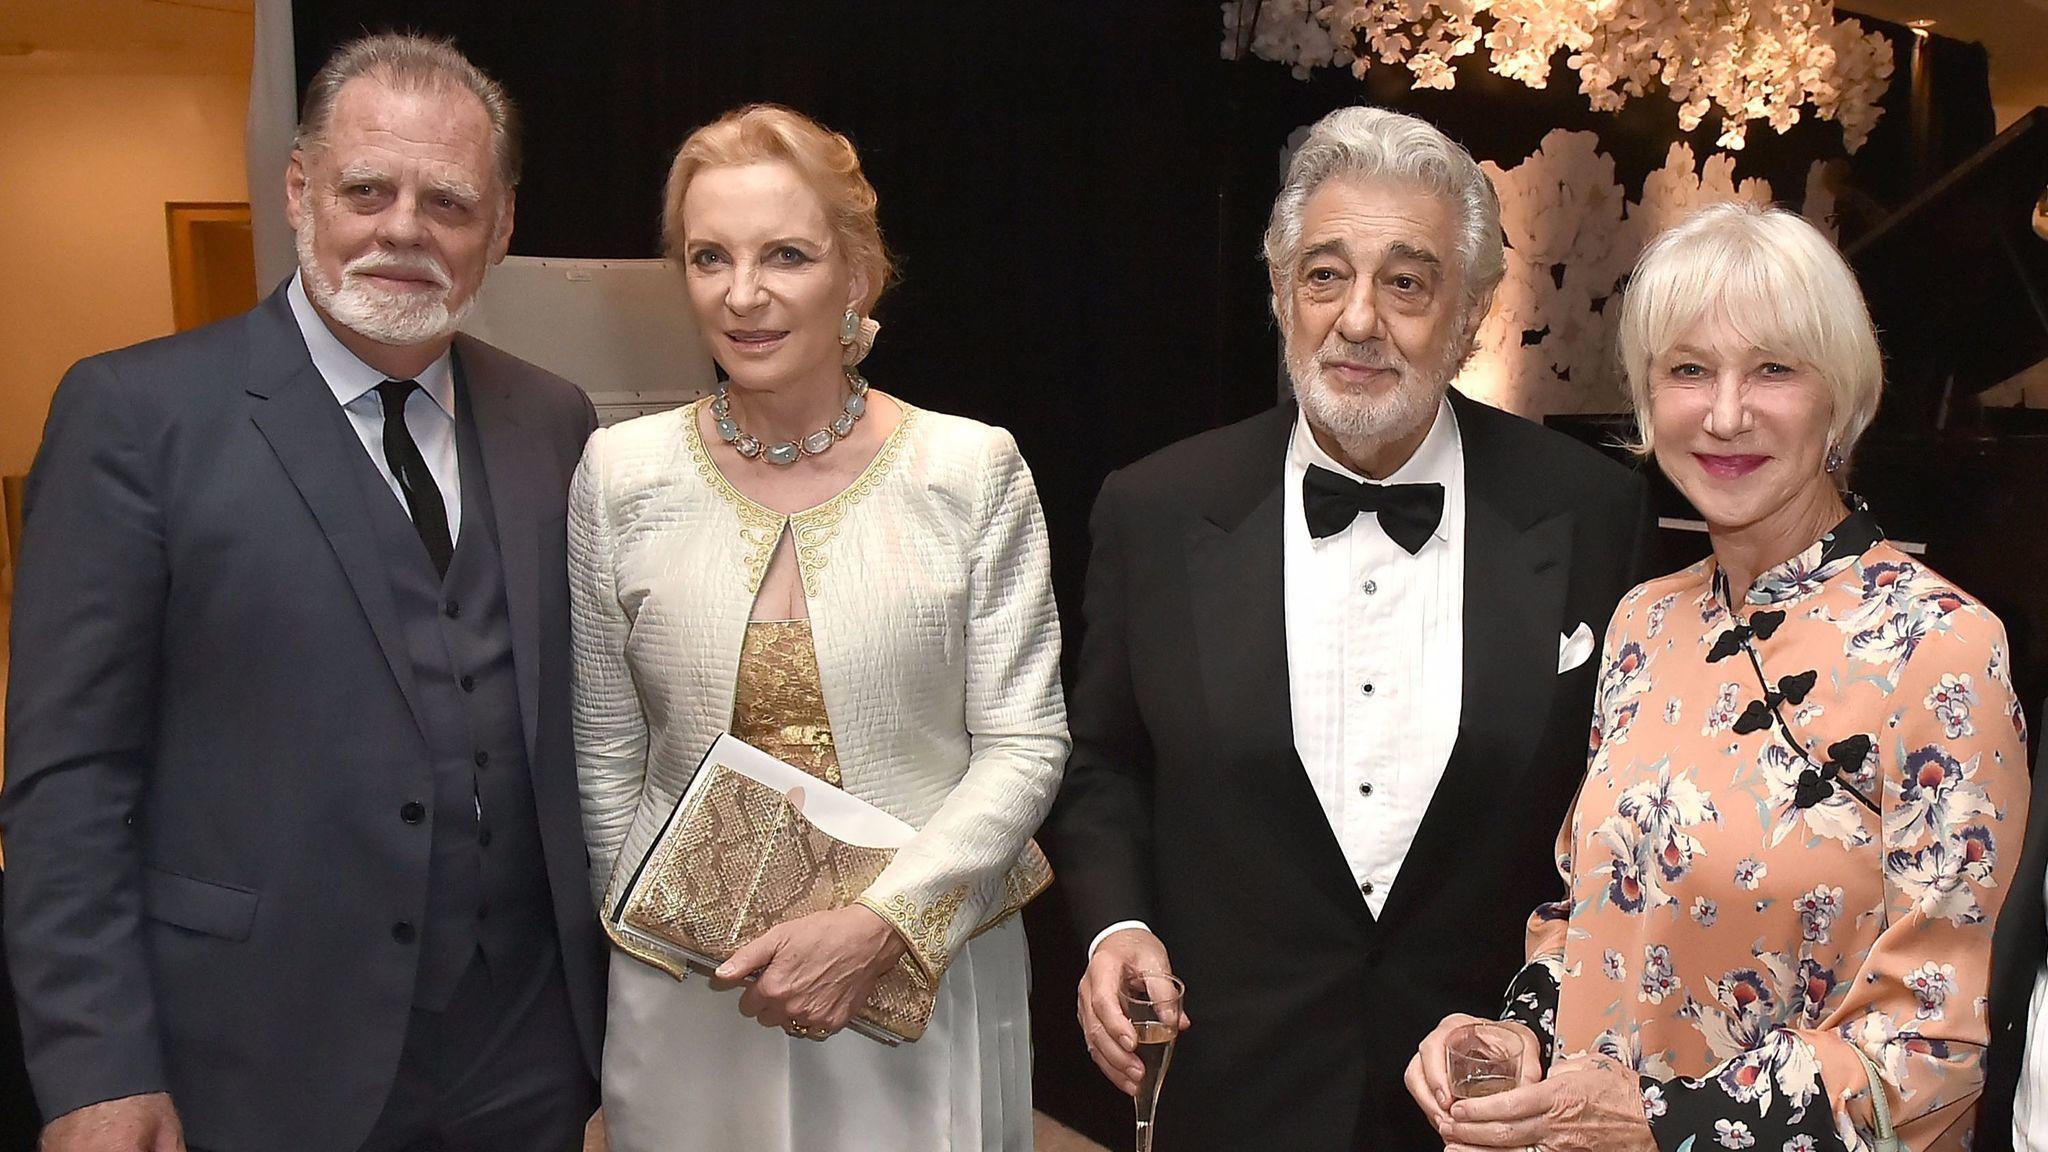 Taylor Hackford left, Princess Michael of Kent, Plácido Domingo and Helen Mirren.